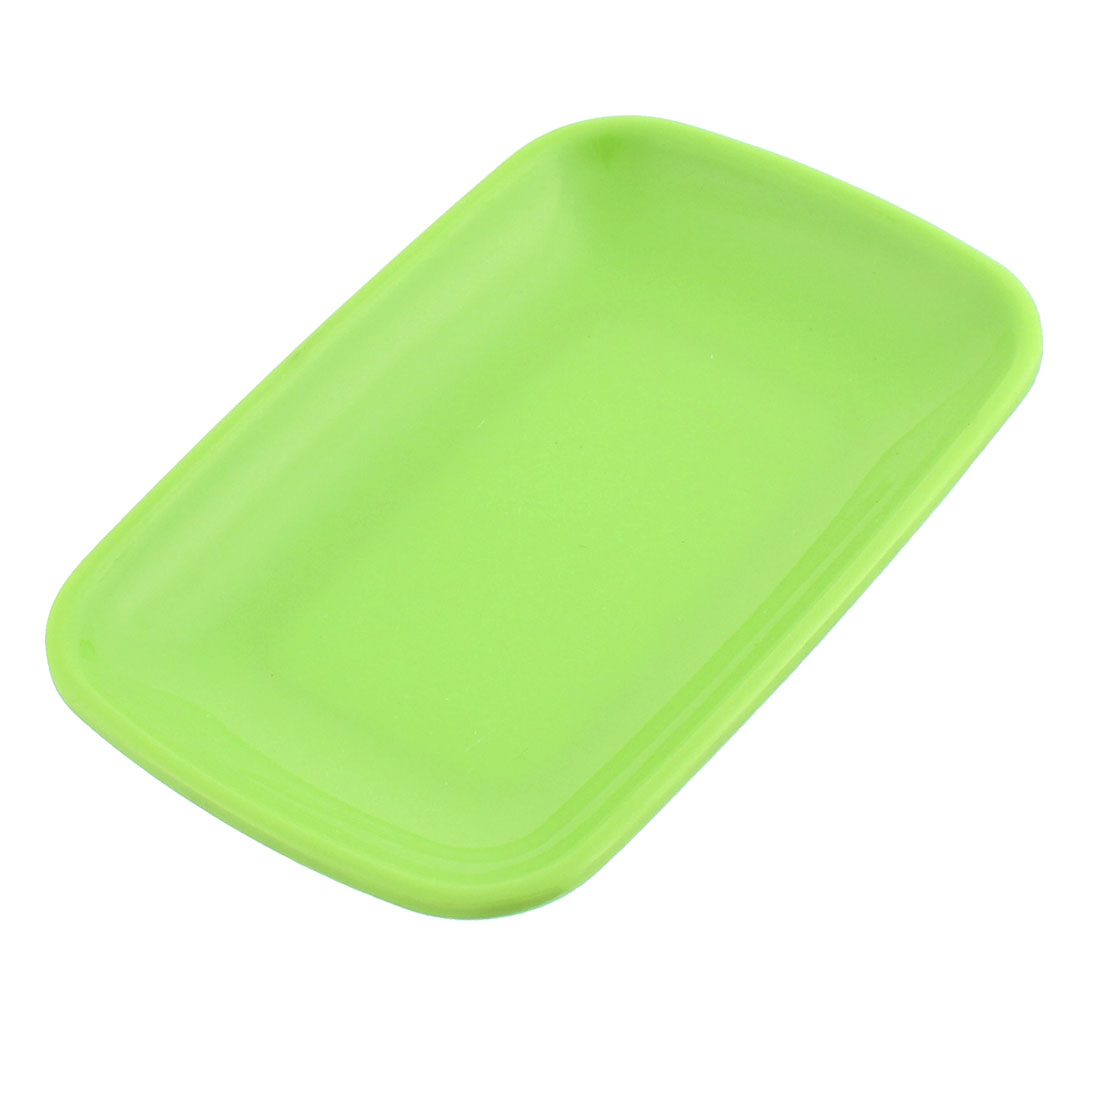 Restaurant Plastic Rectangle Shaped Dessert Pickles Appetizer Plate Dish Green